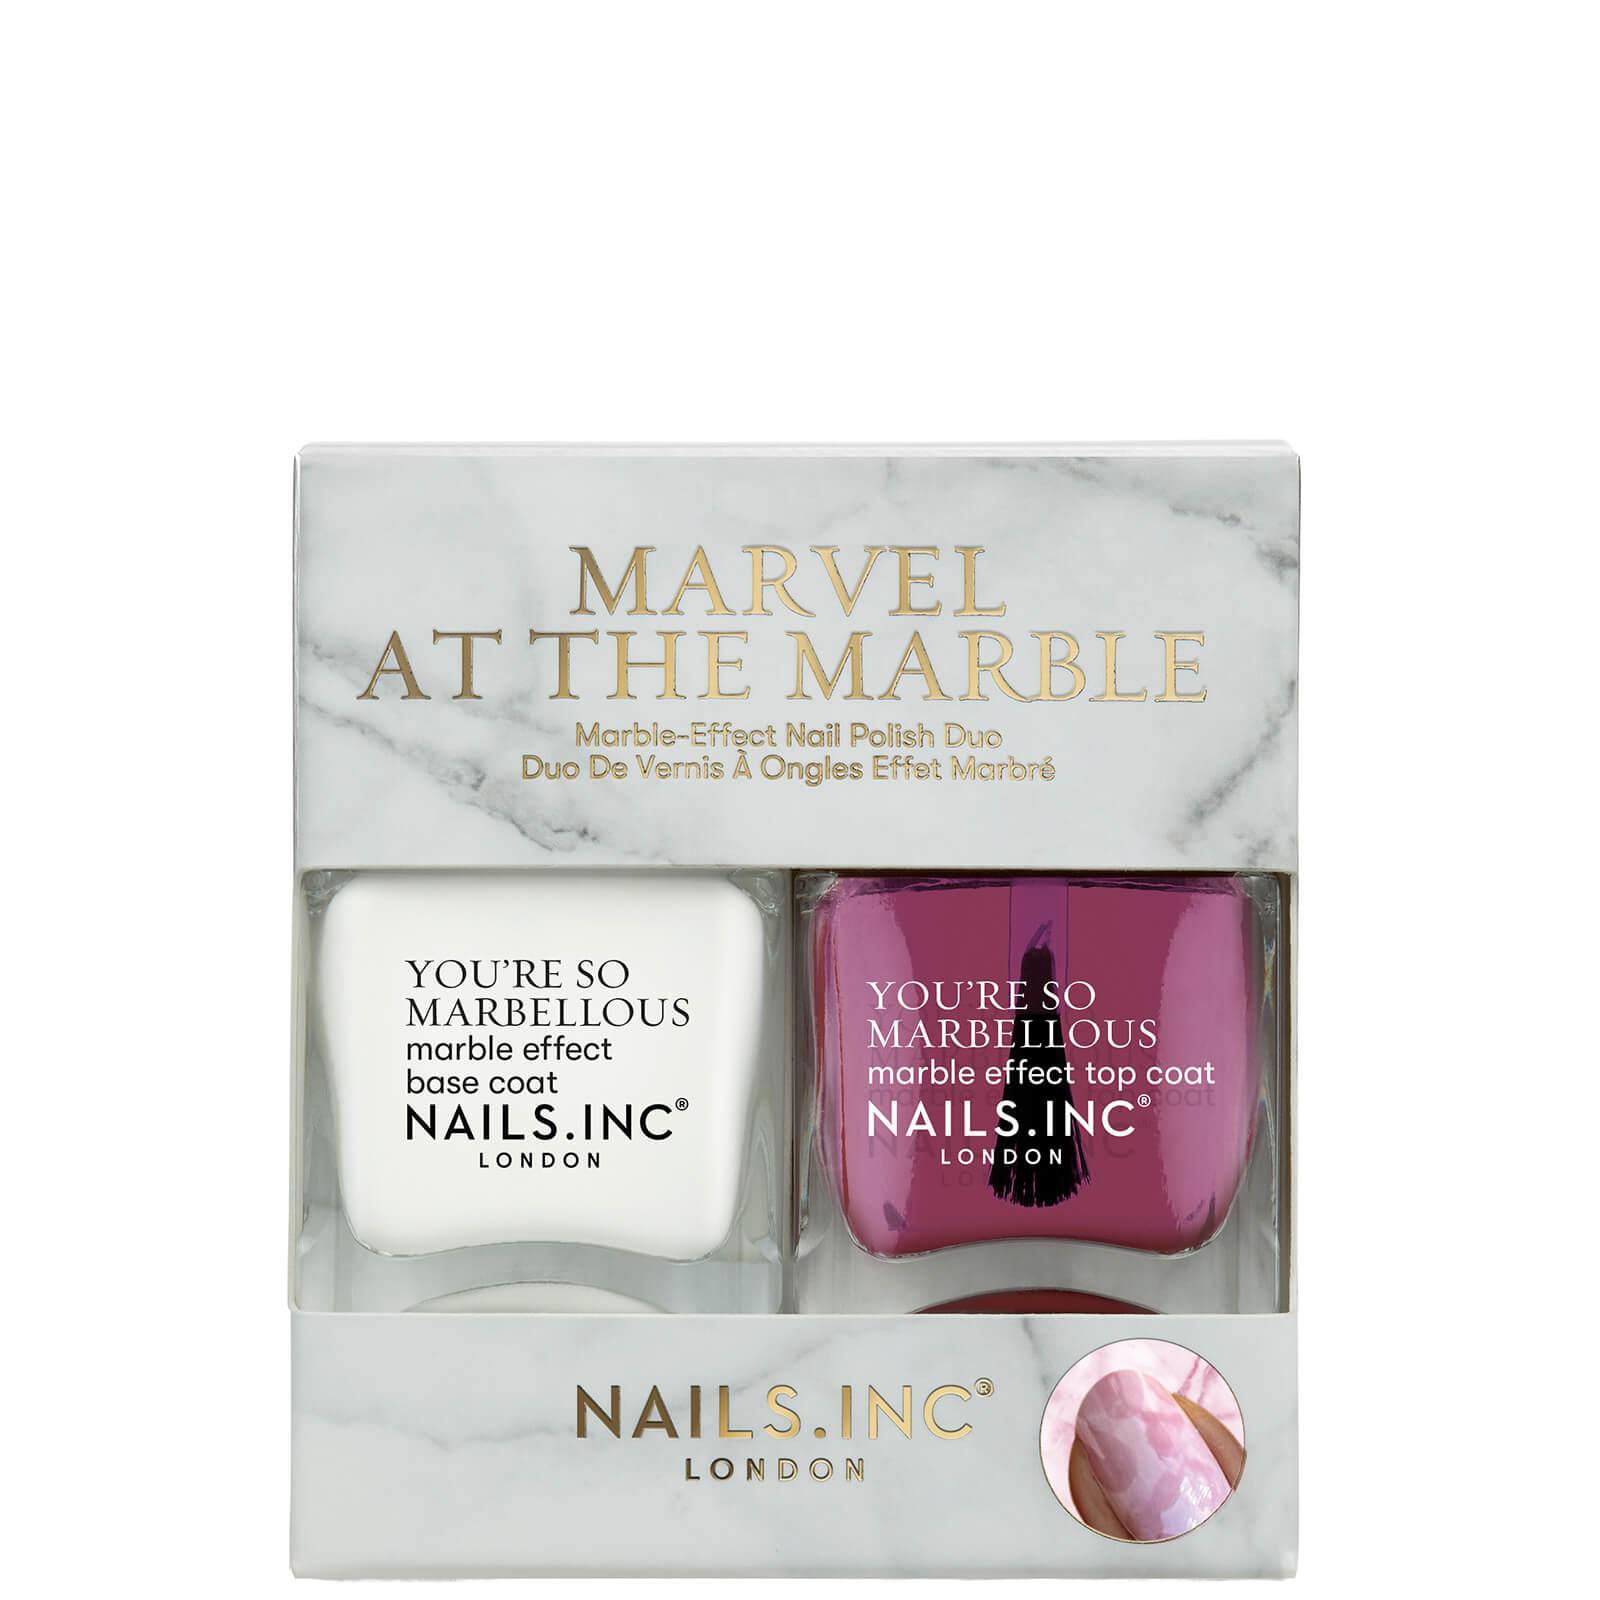 Купить Nails inc. Marvel at the Marble Duo